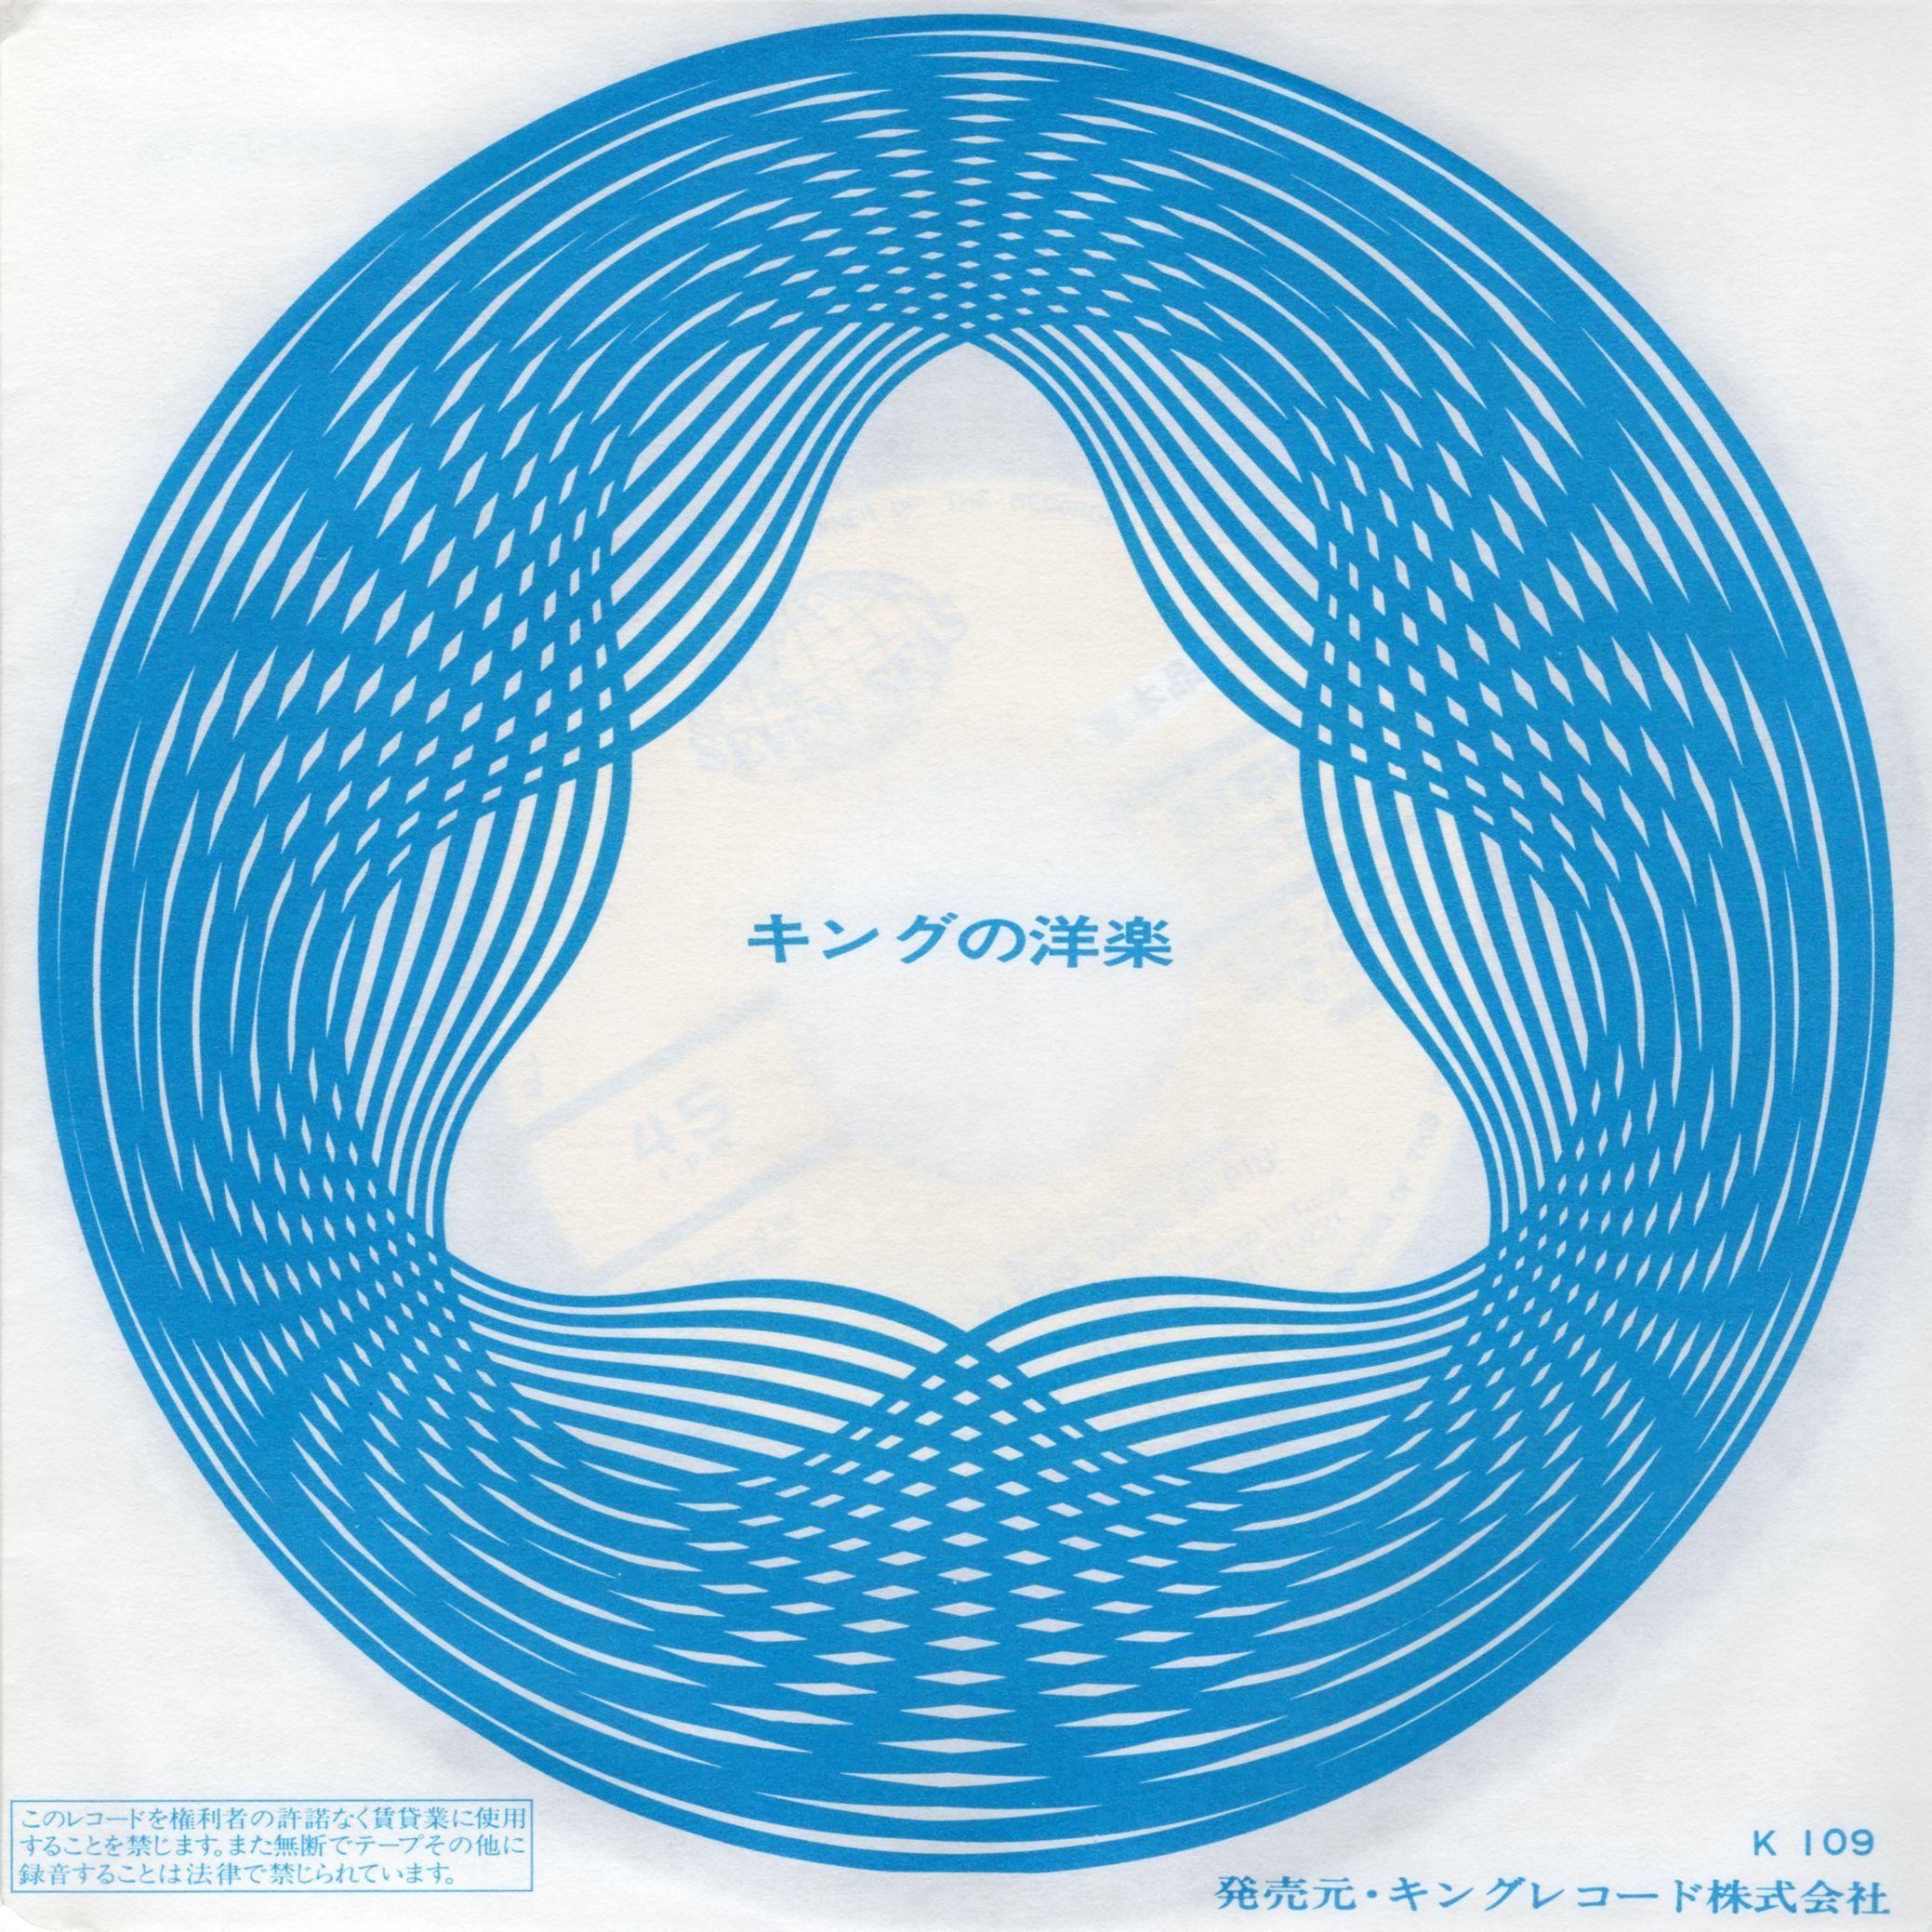 Vinylart Vinyl Collection 45 Kompaku Maurosassi Graphic Design Student Graphic Design Graphic Design Inspiration